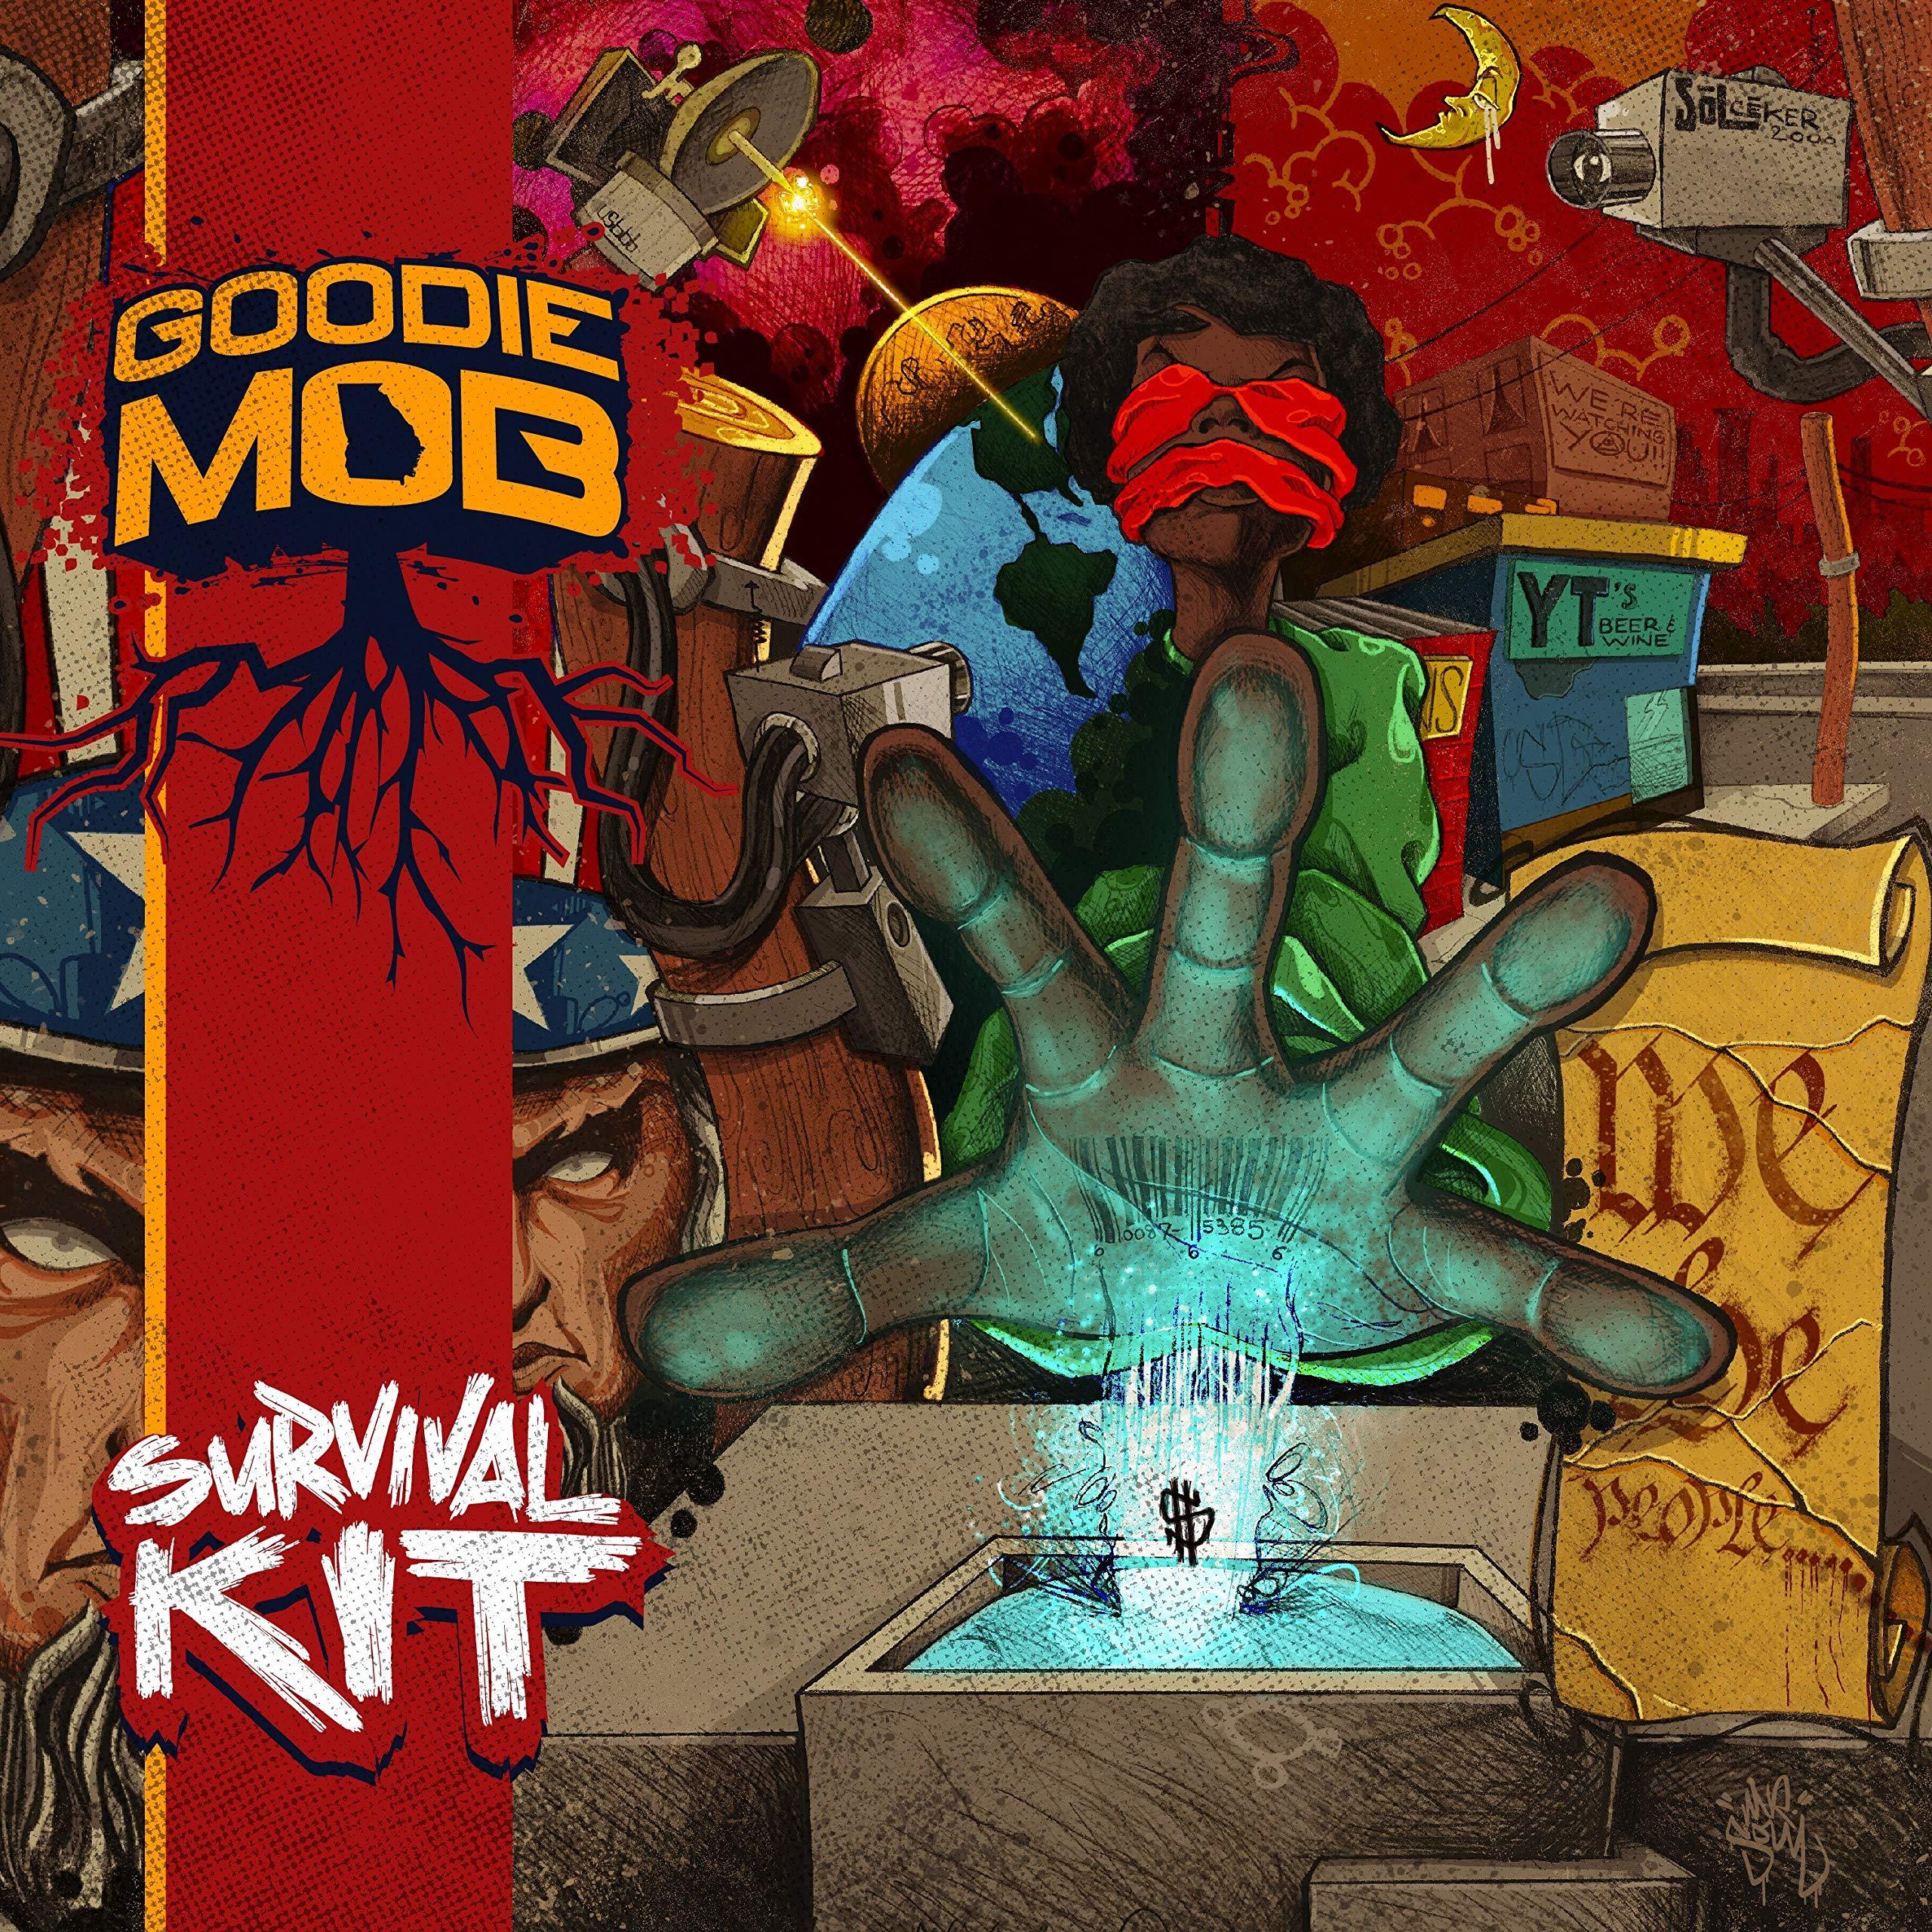 Goodie Mob - Survival Kit (2020) [FLAC] Download